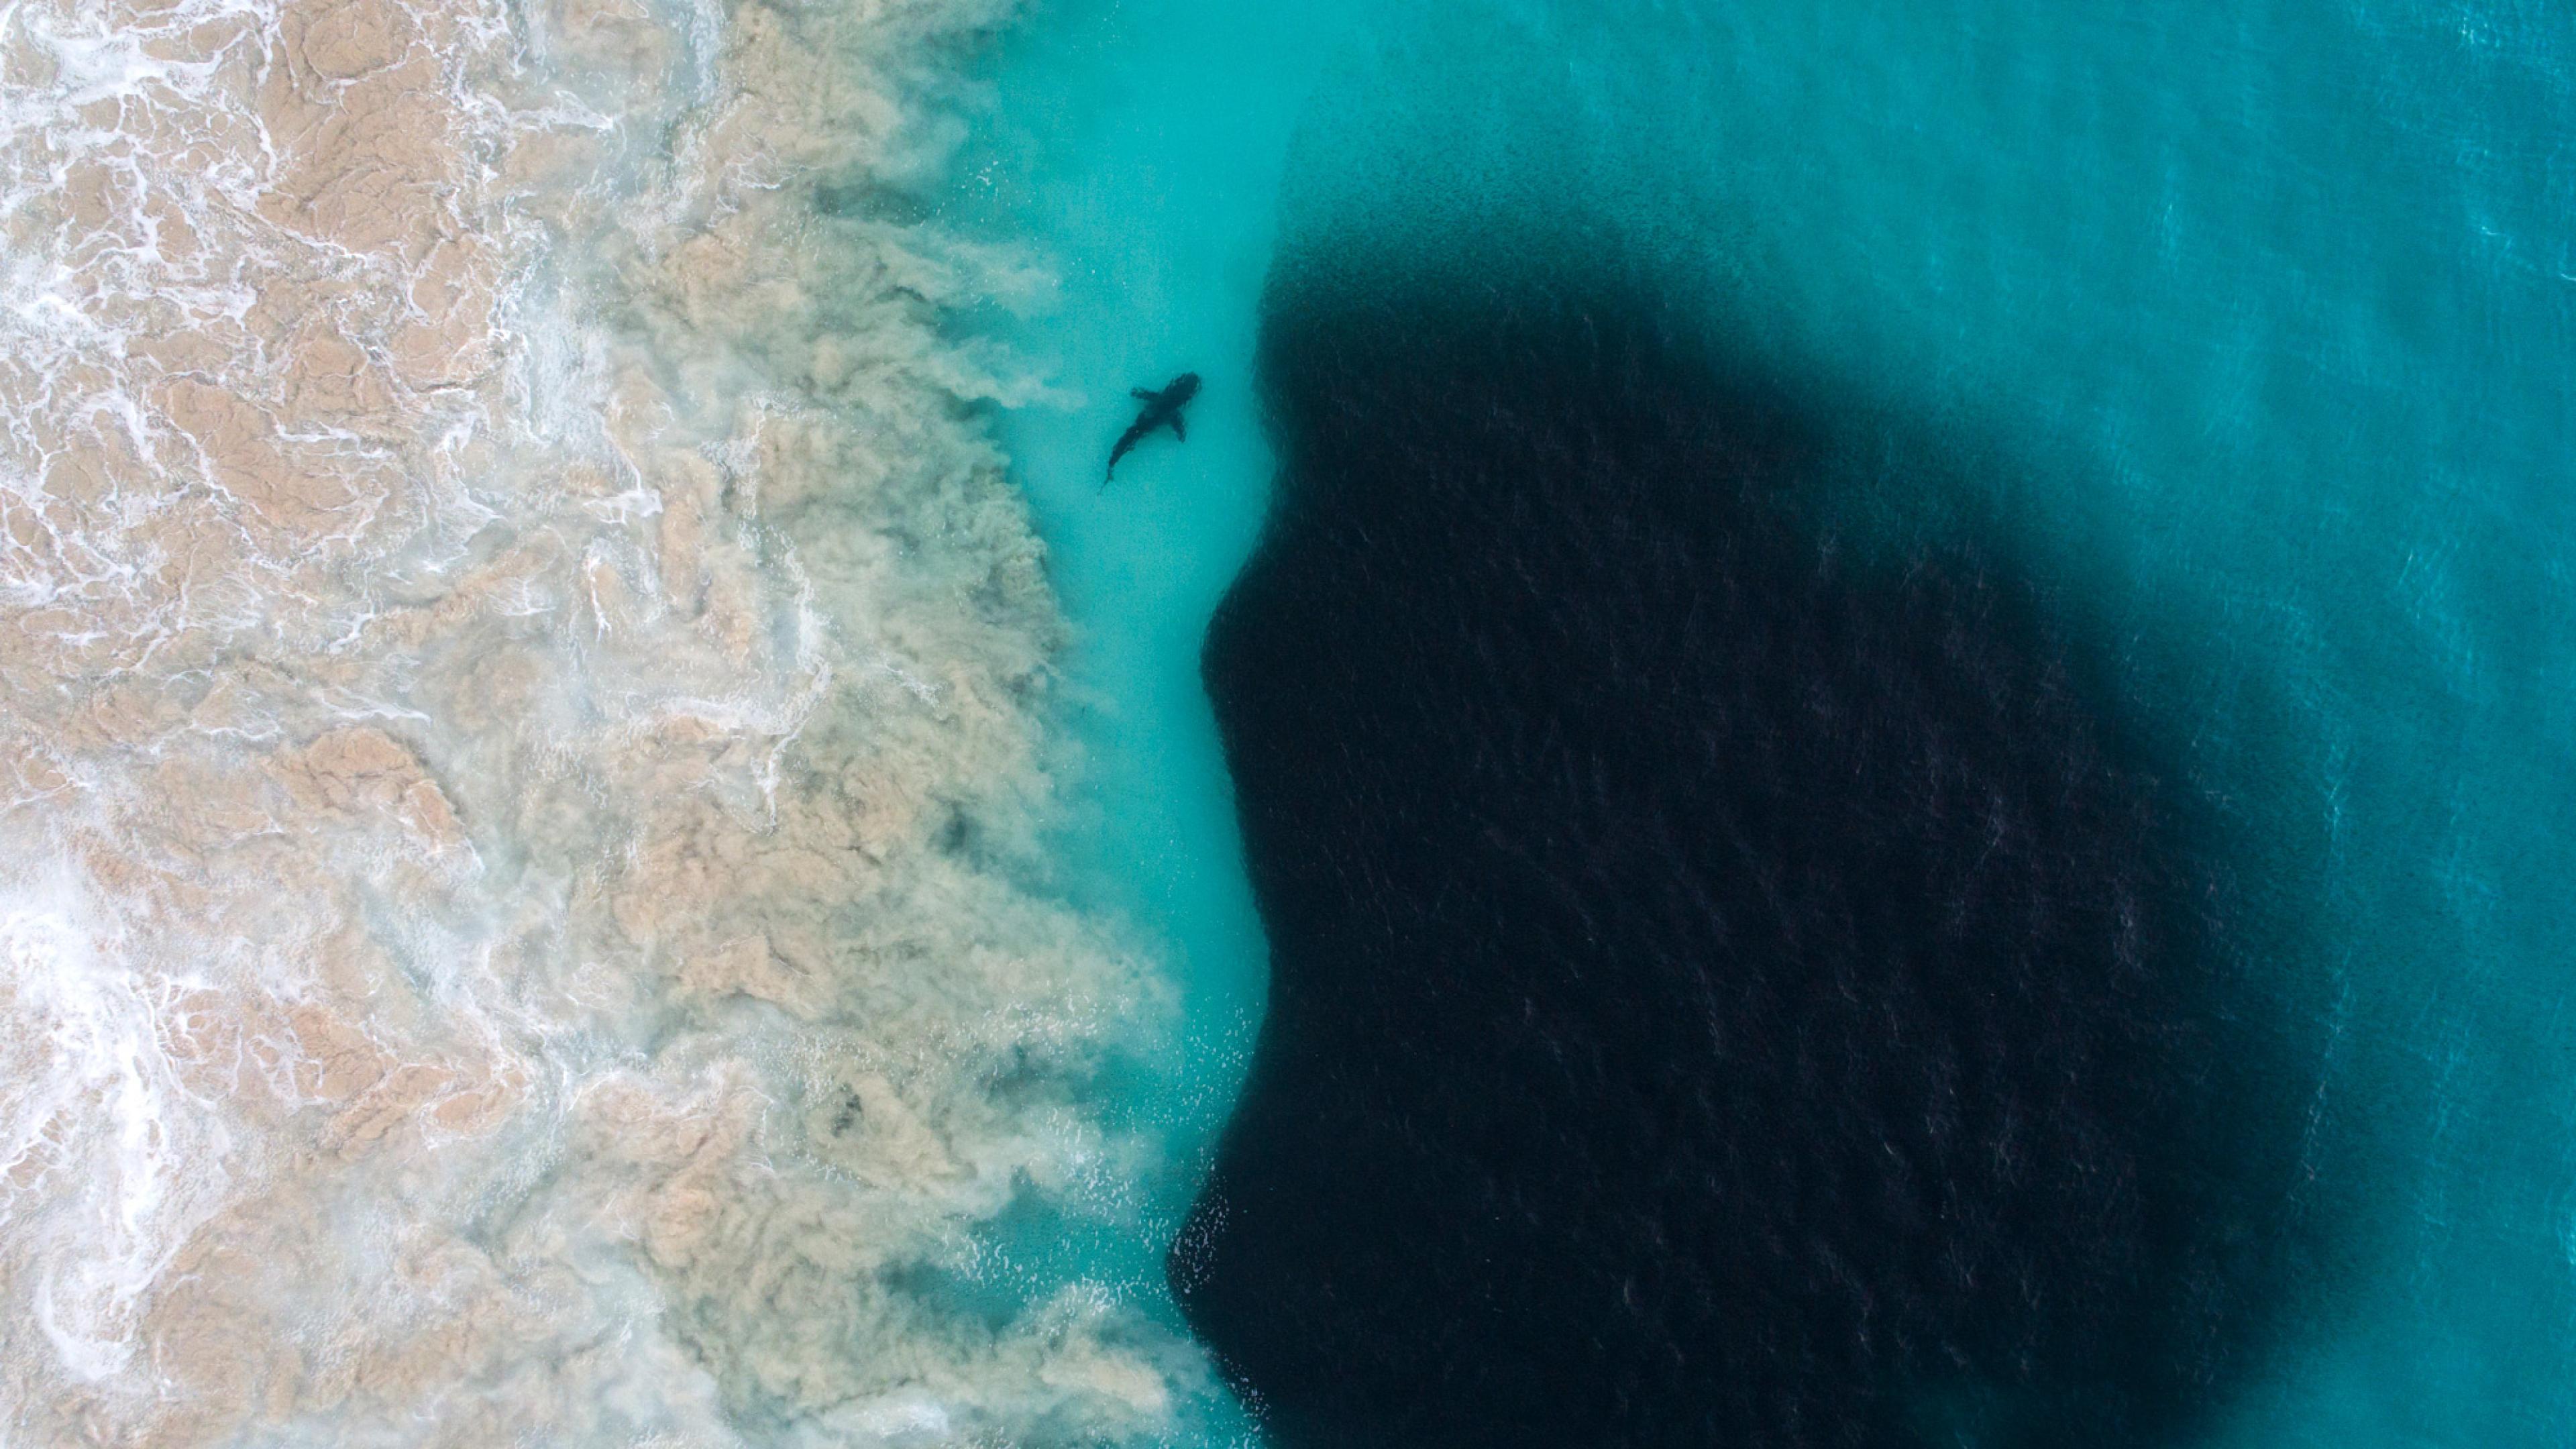 3840x2160 Aerial View Of Shark Inside Deep Sea 4k Wallpaper